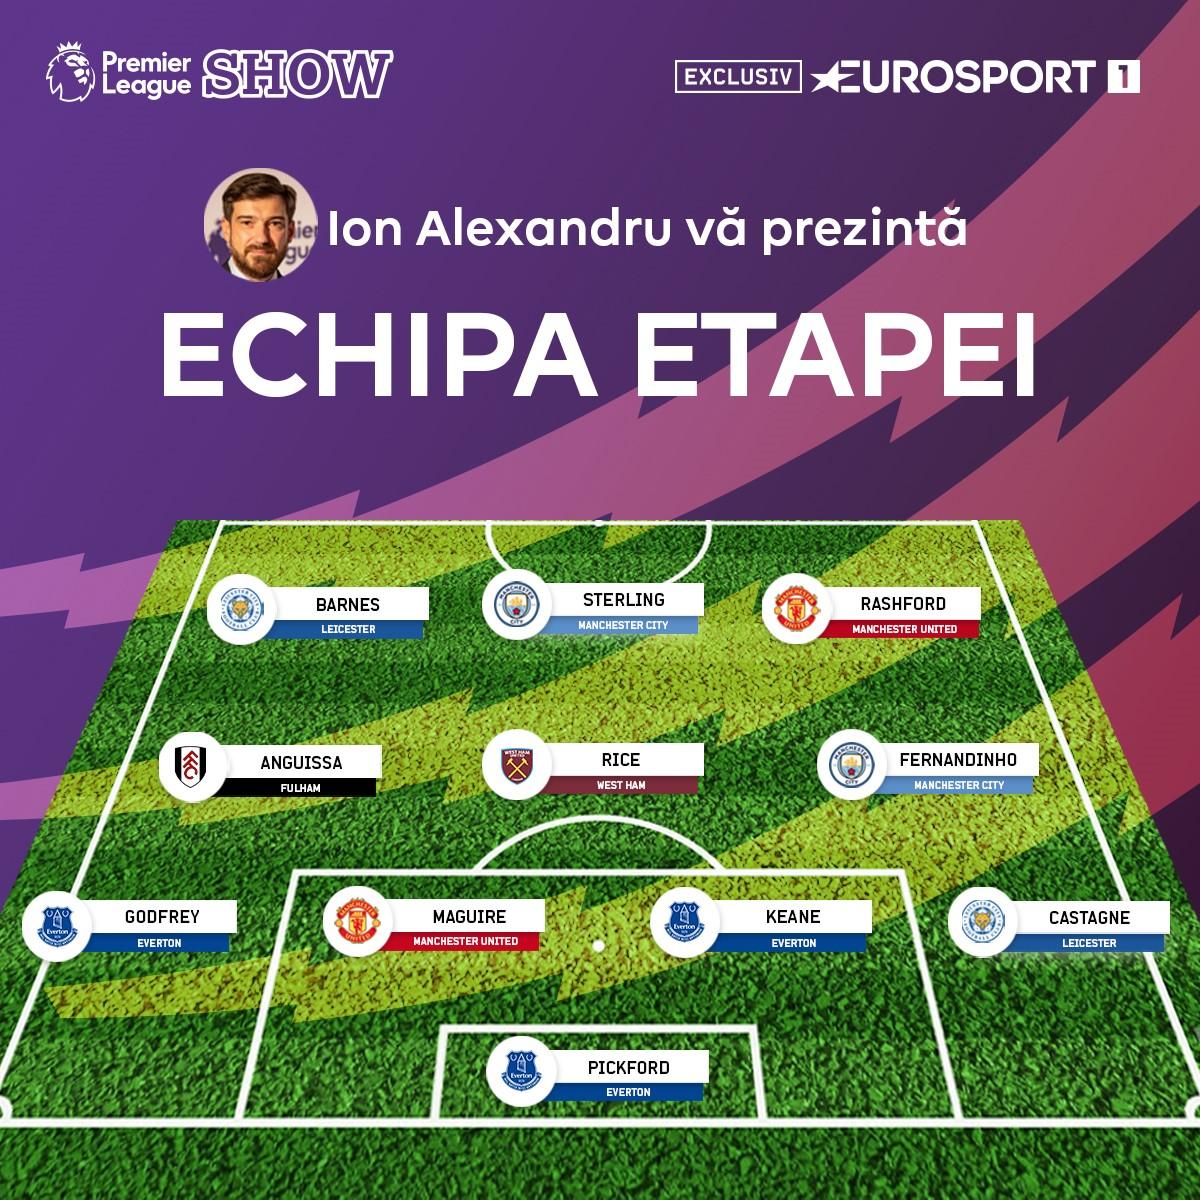 https://i.eurosport.com/2021/02/22/3000406.jpg